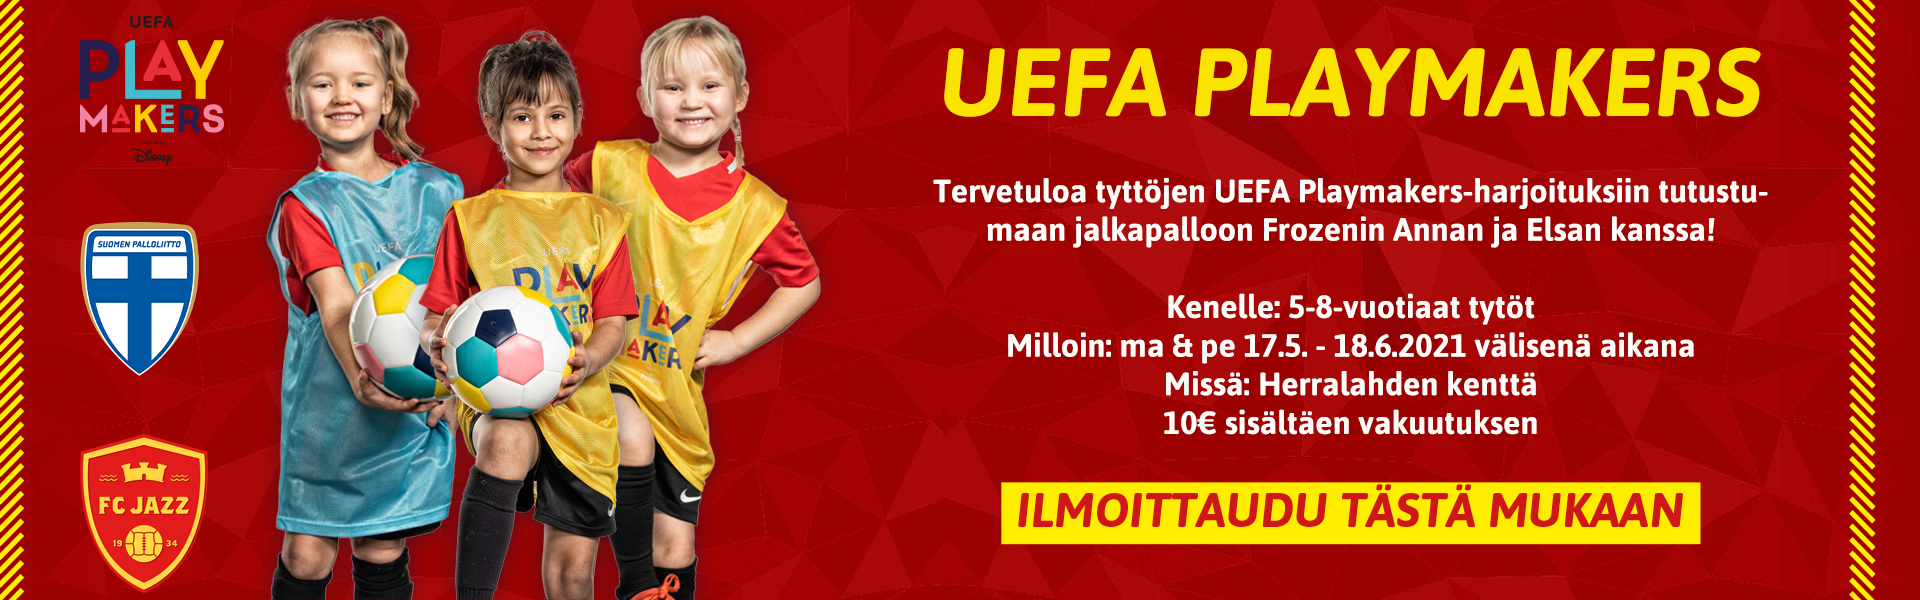 UEFA Playmakers alkaa!